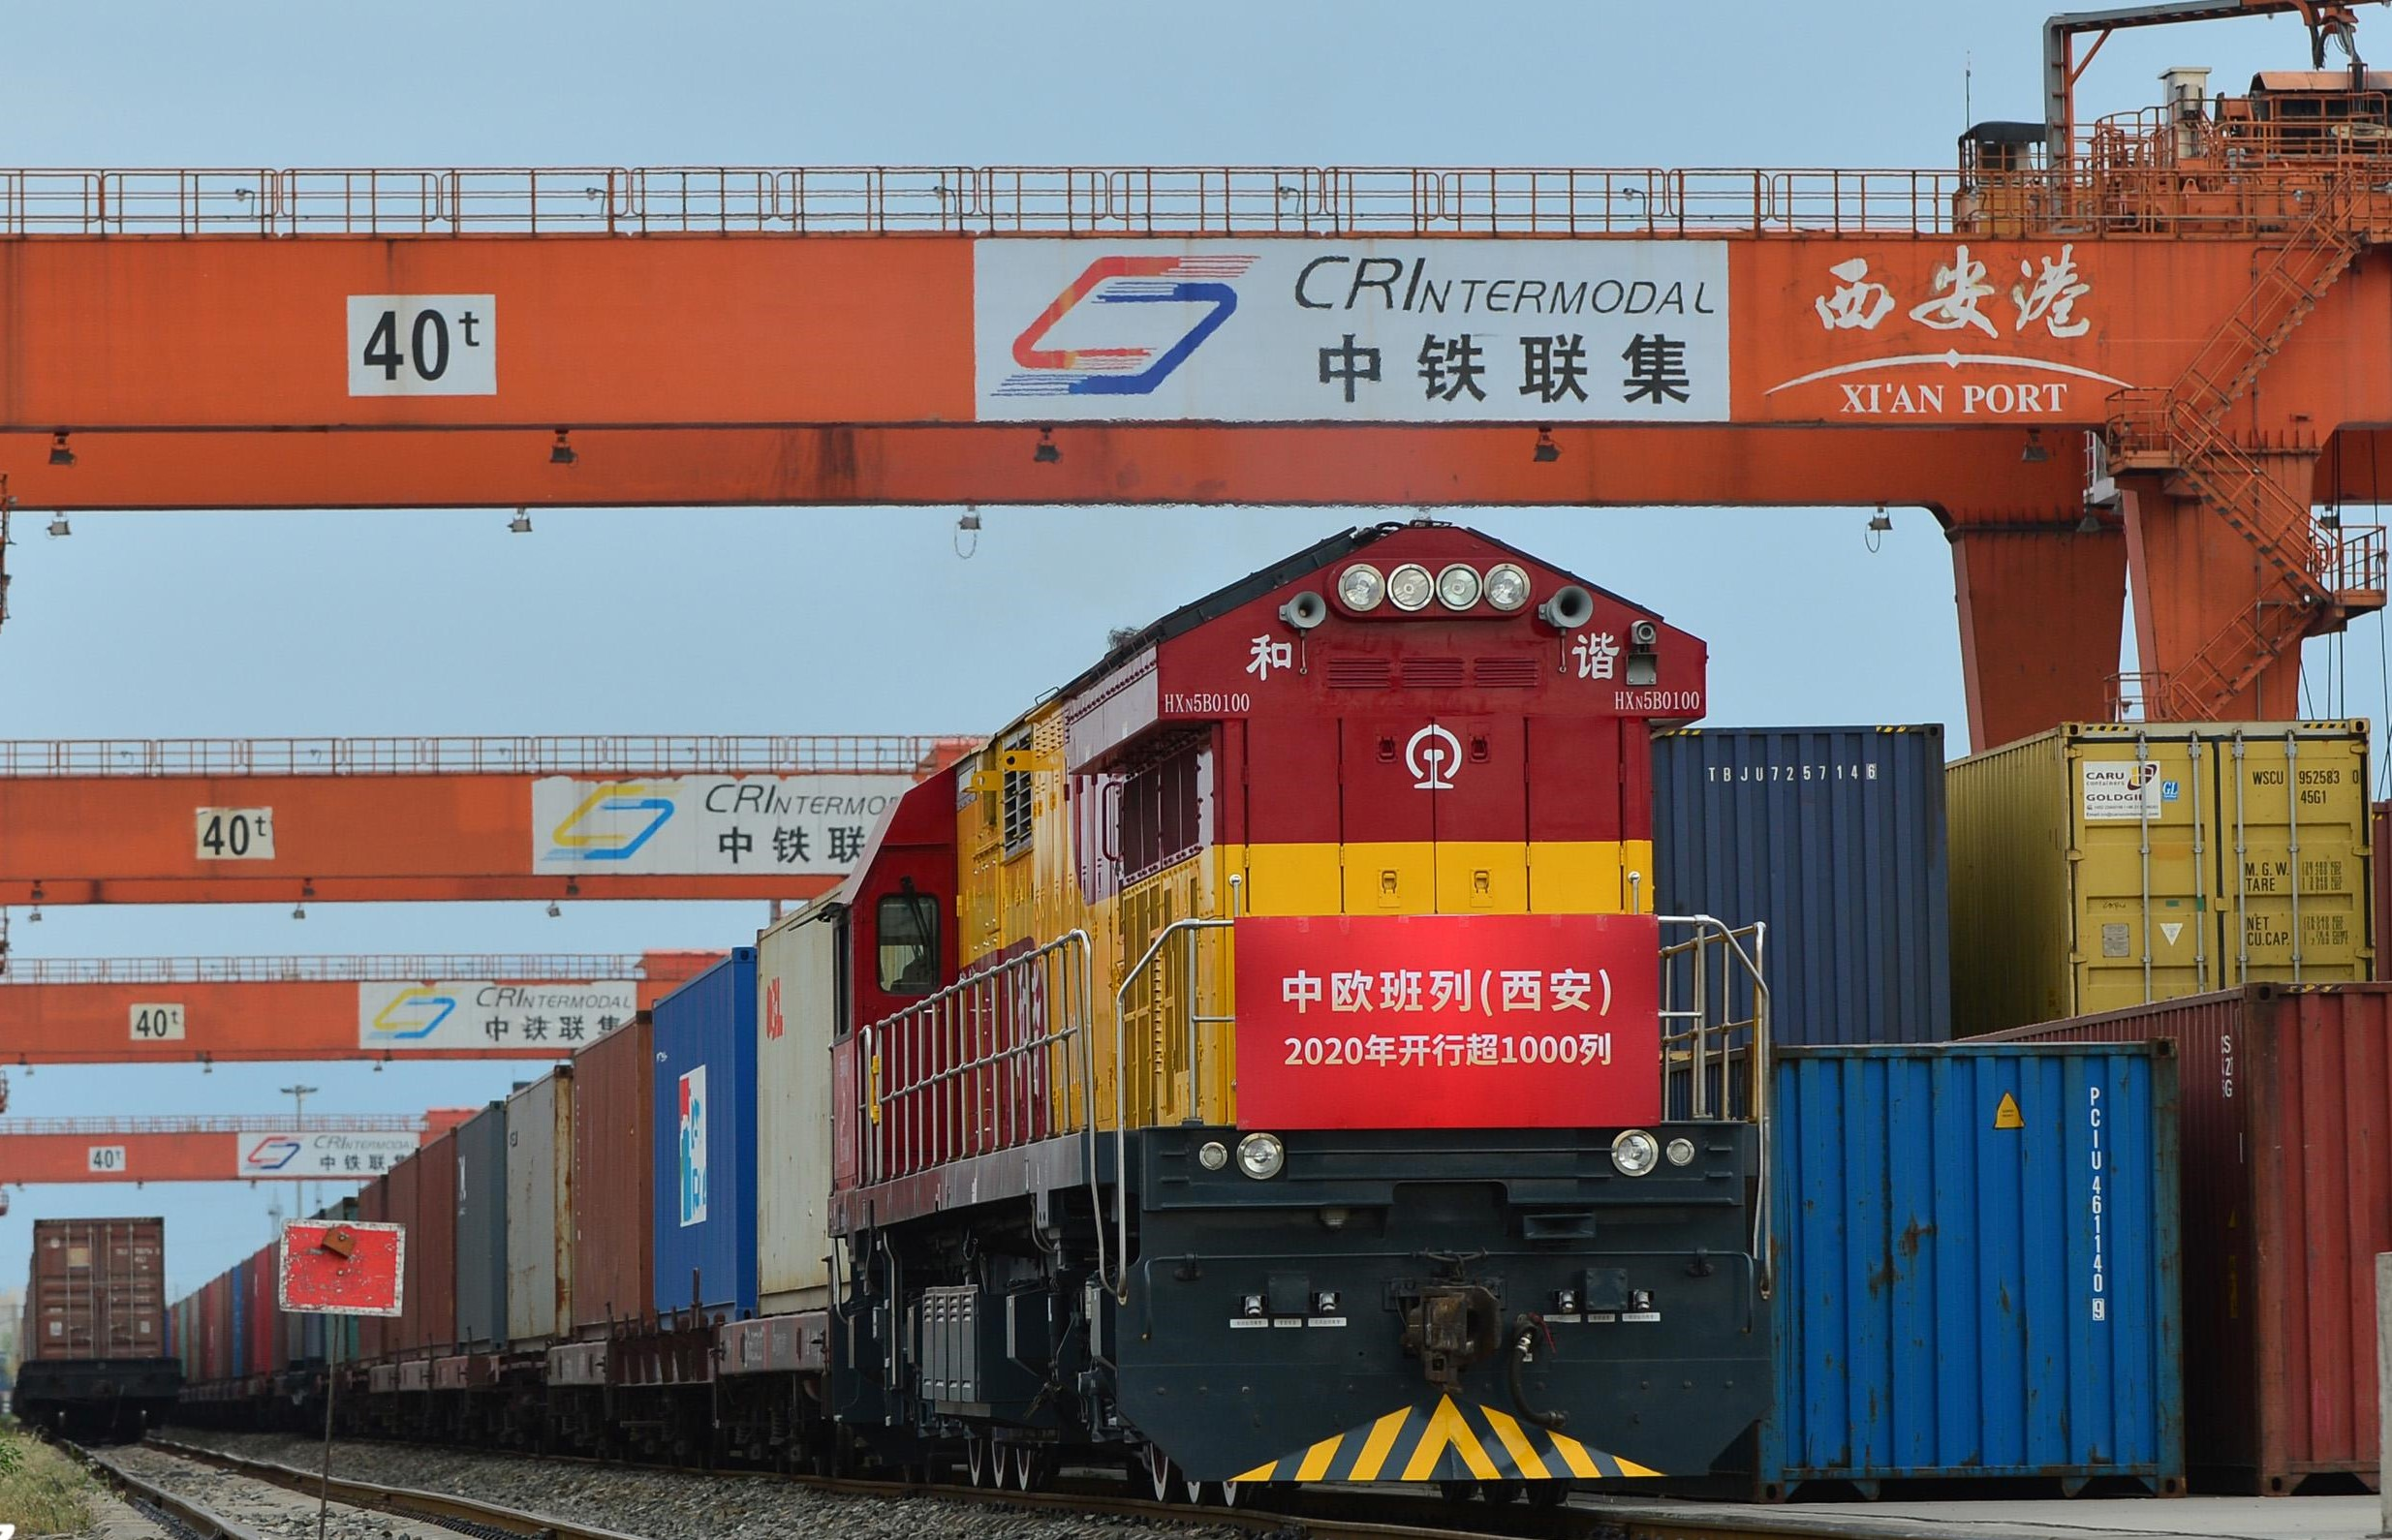 Train leaving Xi'an